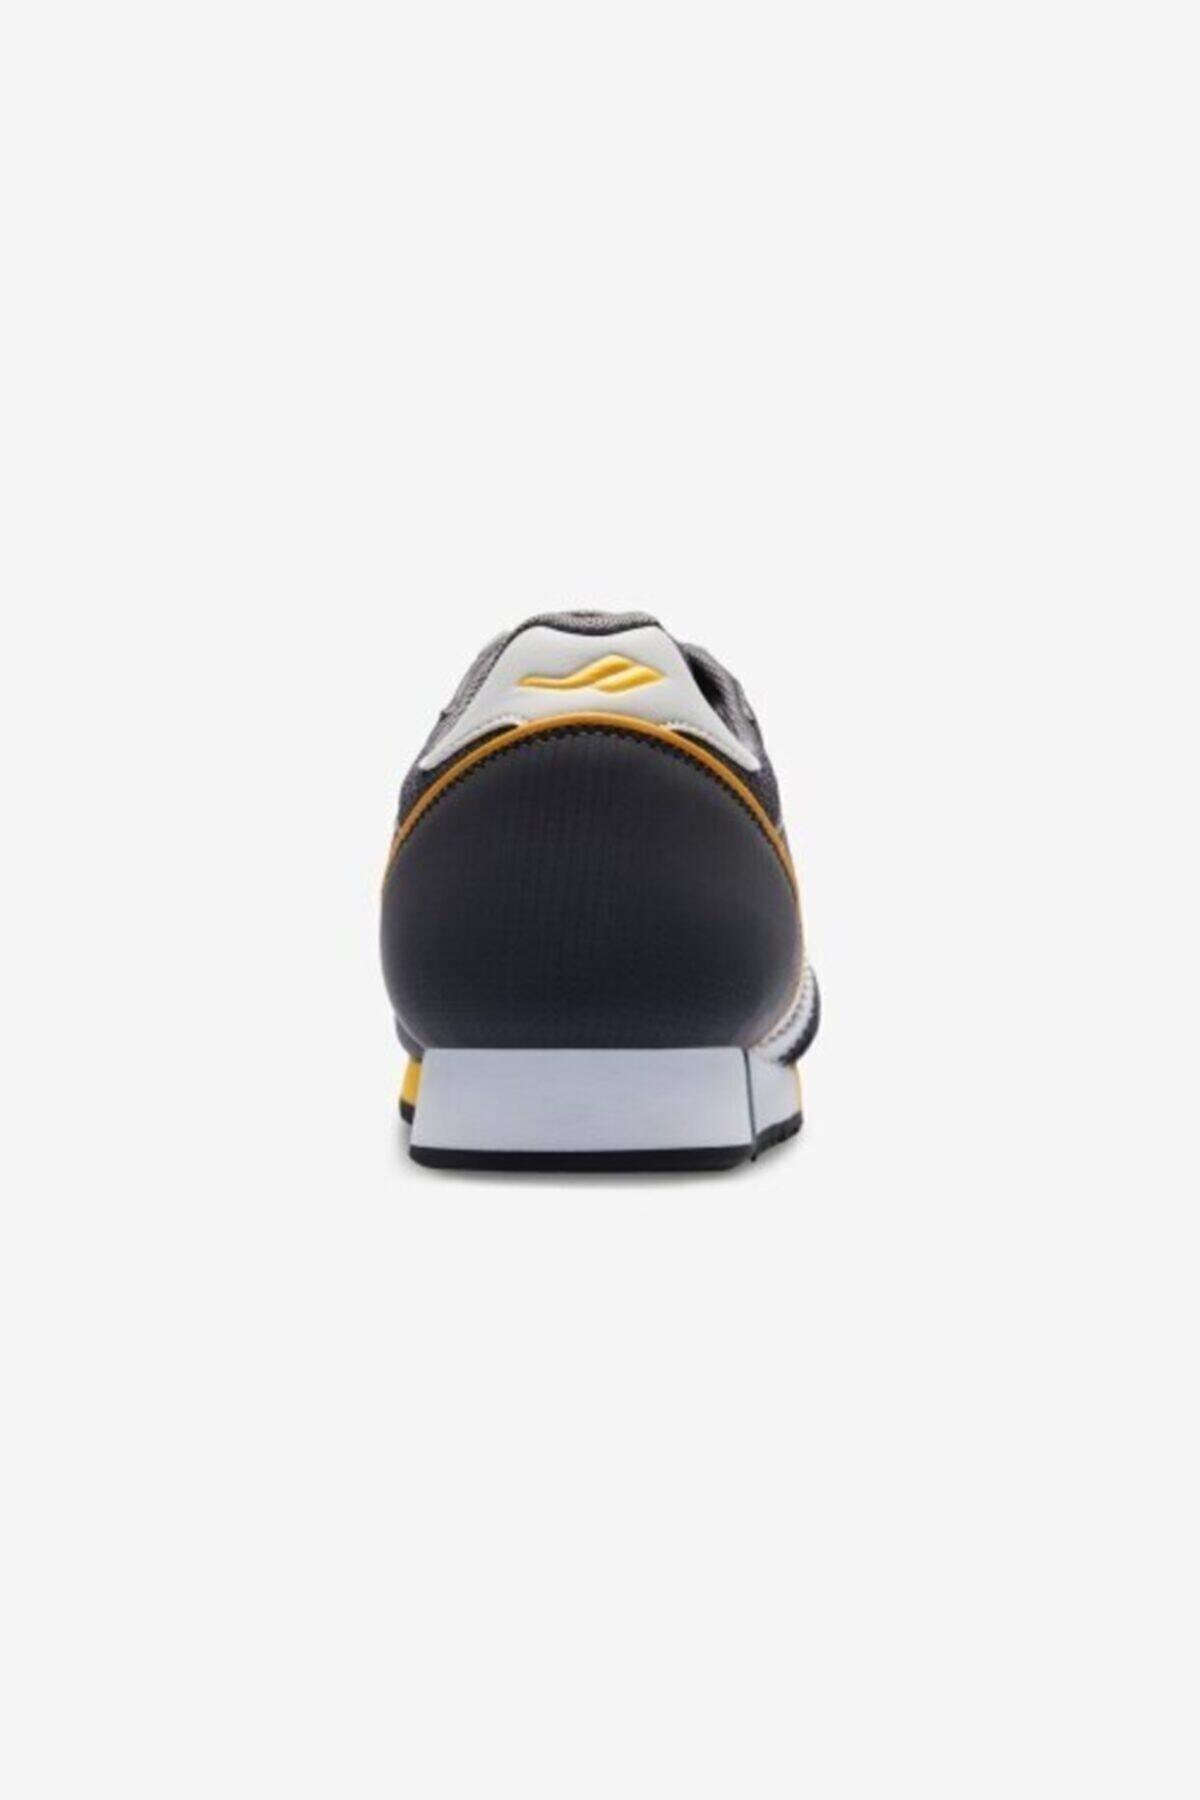 Lescon Sneaker Ayakkabı 21bae00snbom276 Boston-2 2